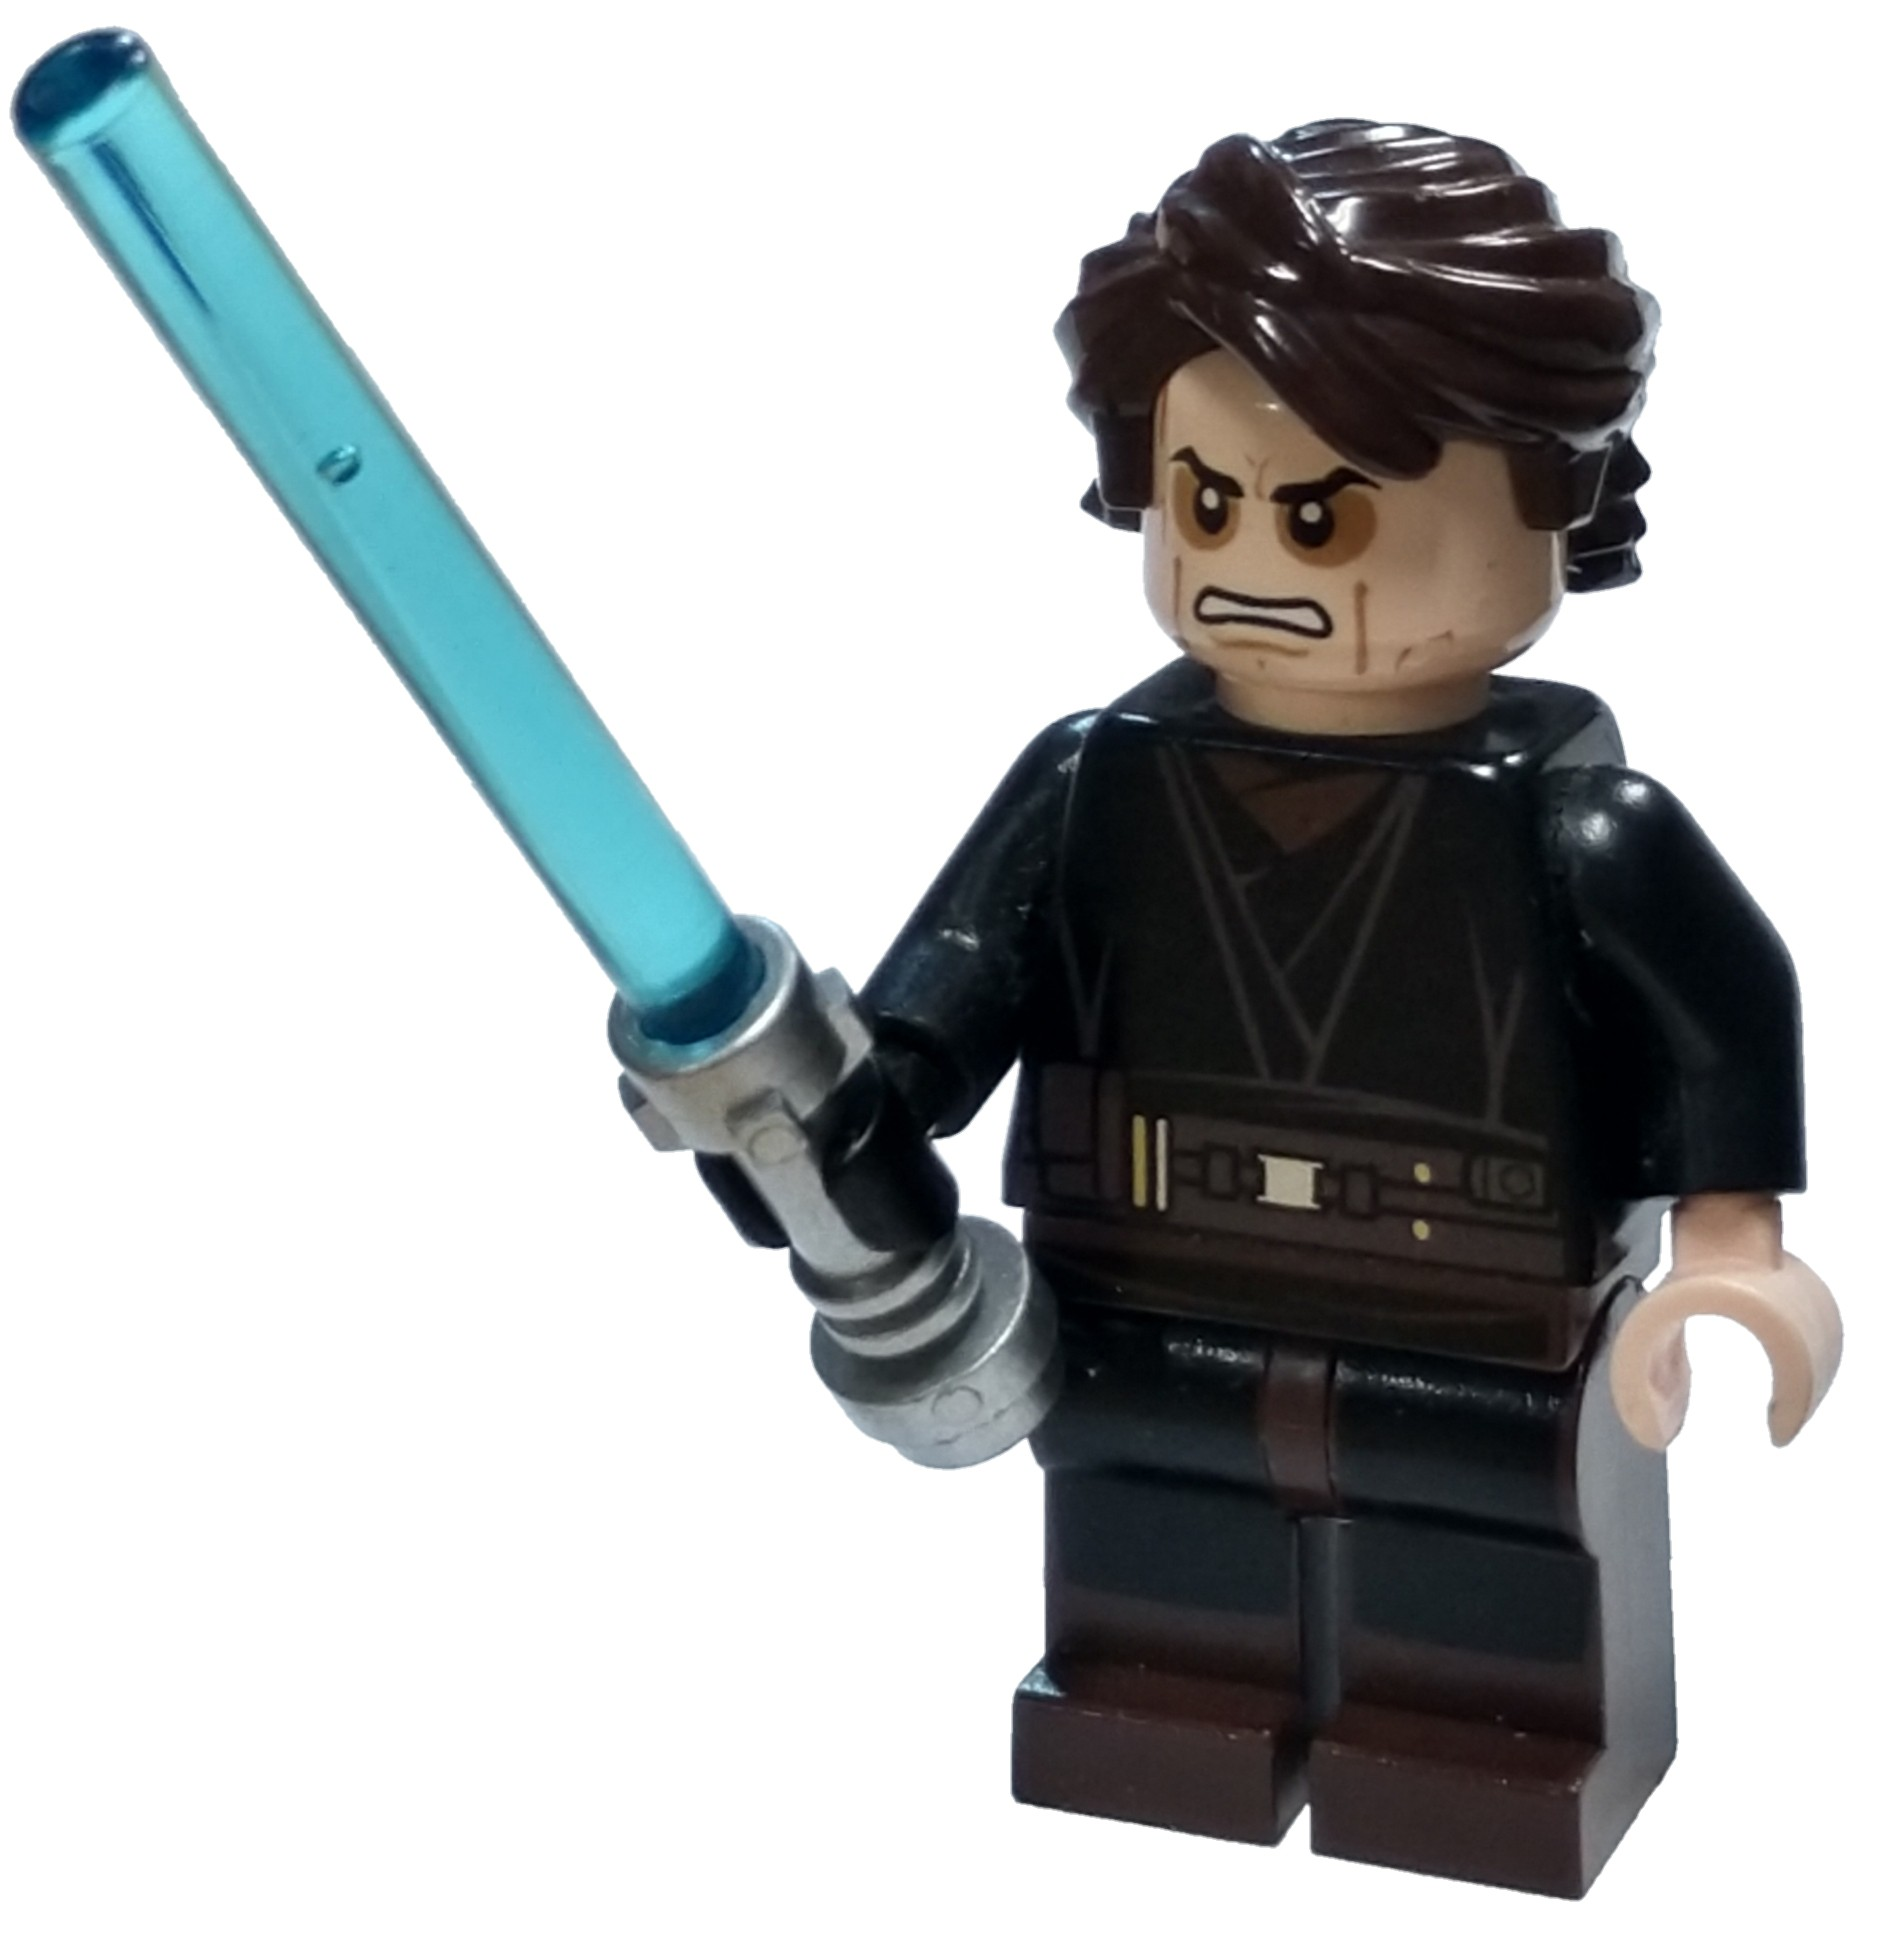 Lego Star Wars Episode 3 Anakin Skywalker Minifigure Sith Face Loose Ebay